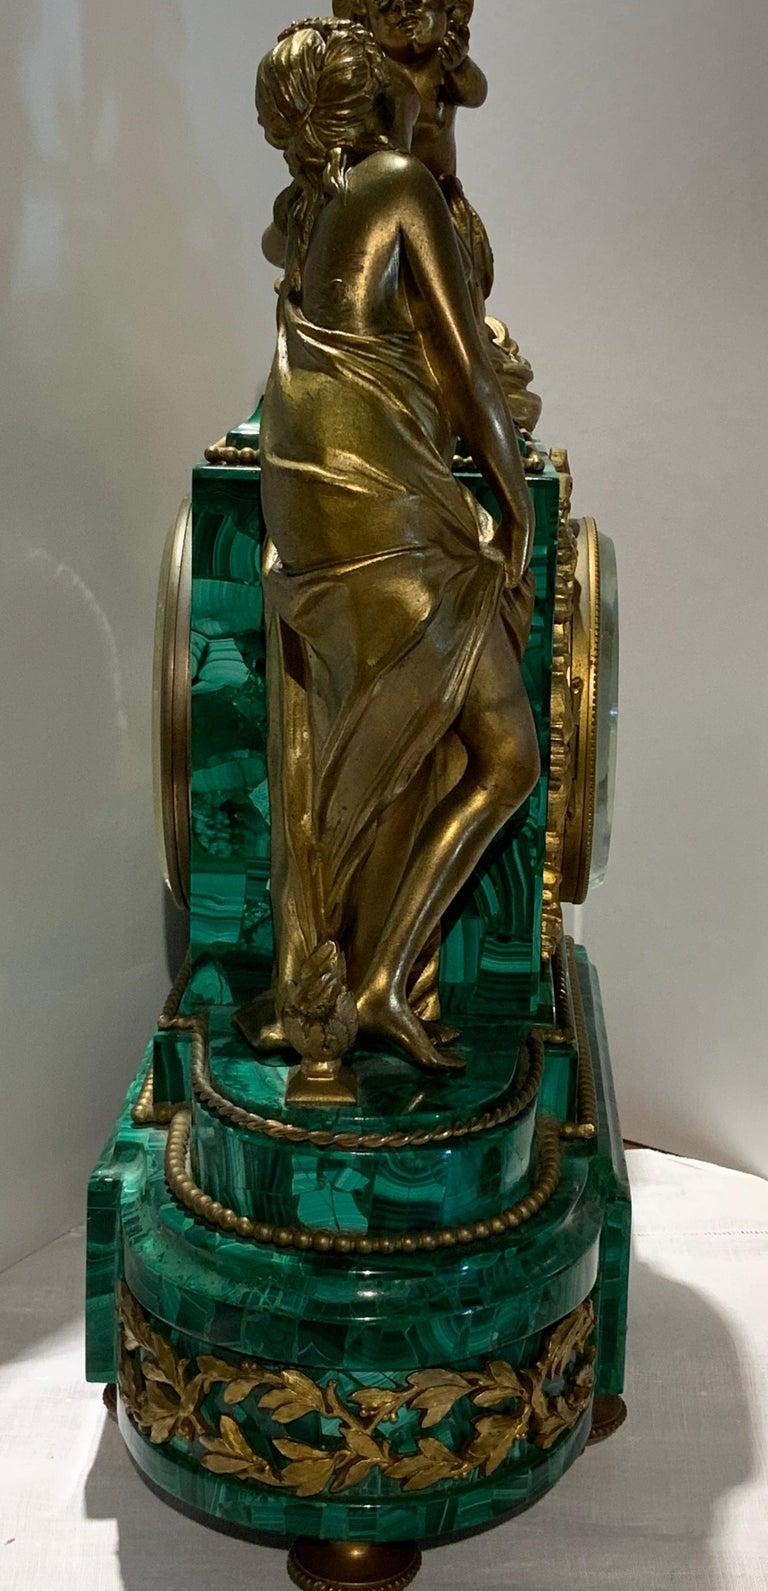 French Louis XVI Style Napoleon III Bronze Mounted Malachite Mantel Clock For Sale 4